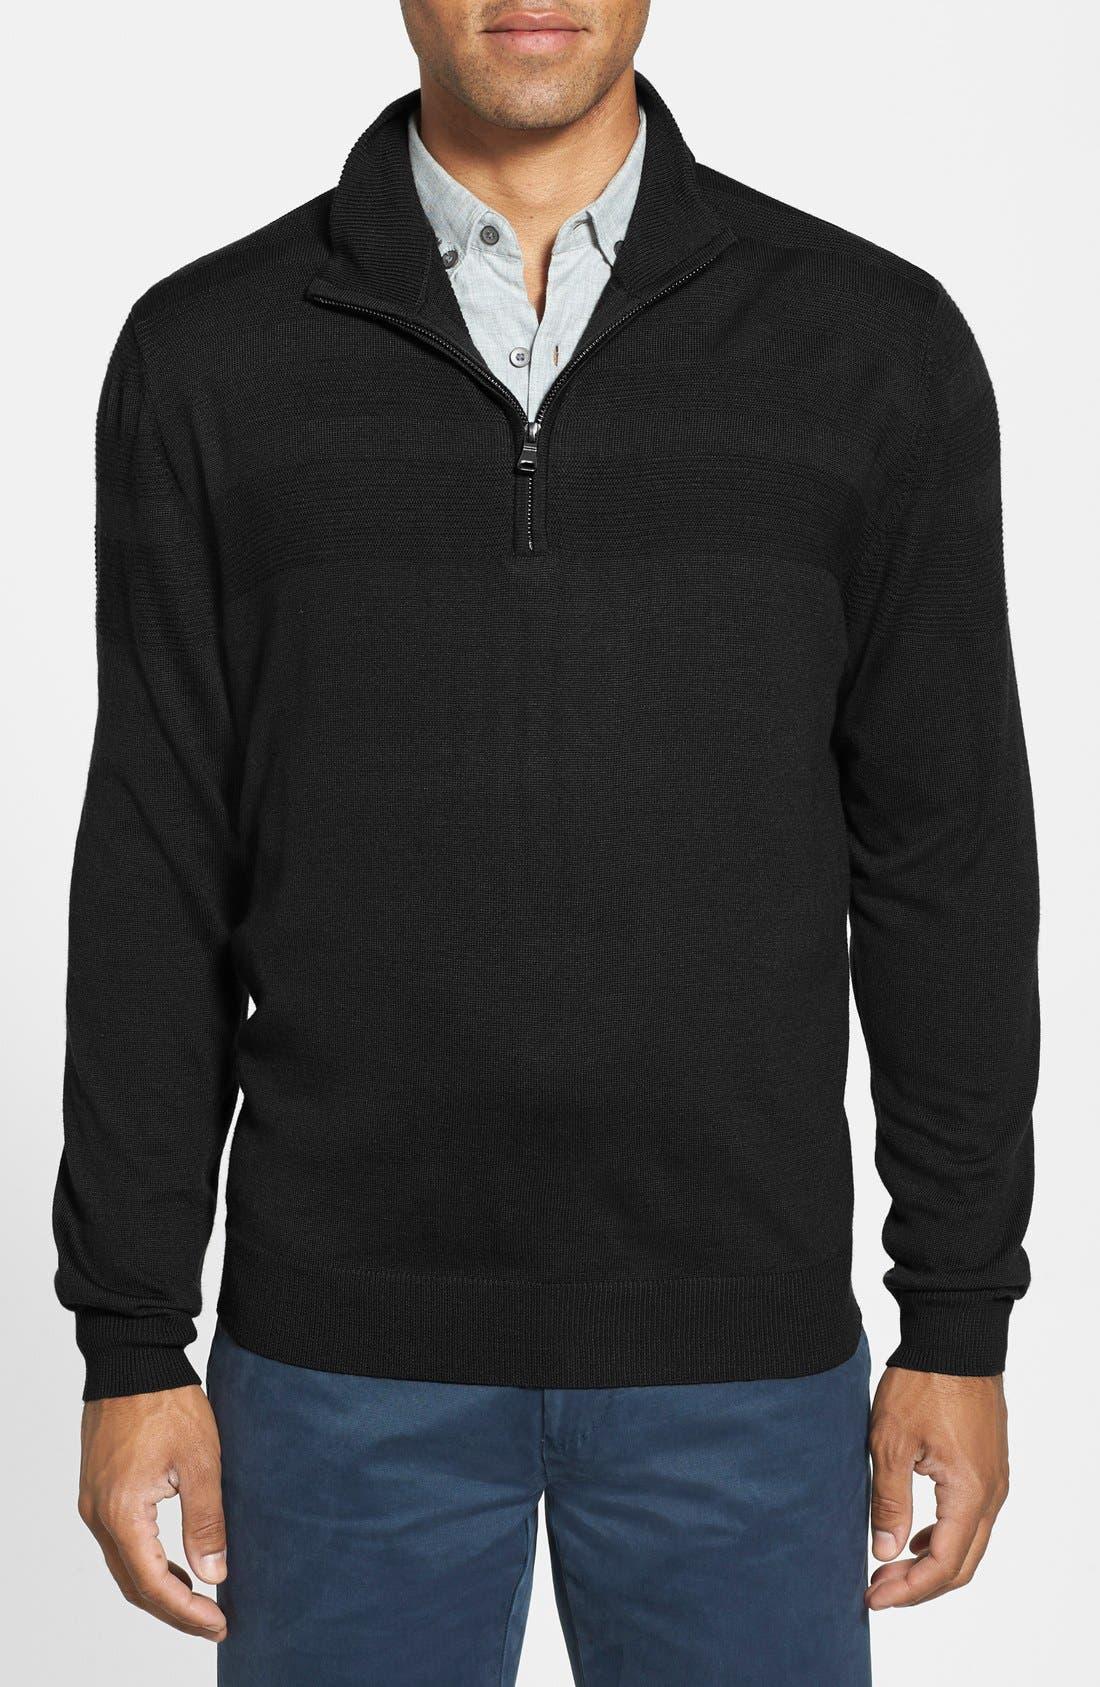 'Douglas' Merino Wool Blend Half Zip Sweater,                         Main,                         color, 001